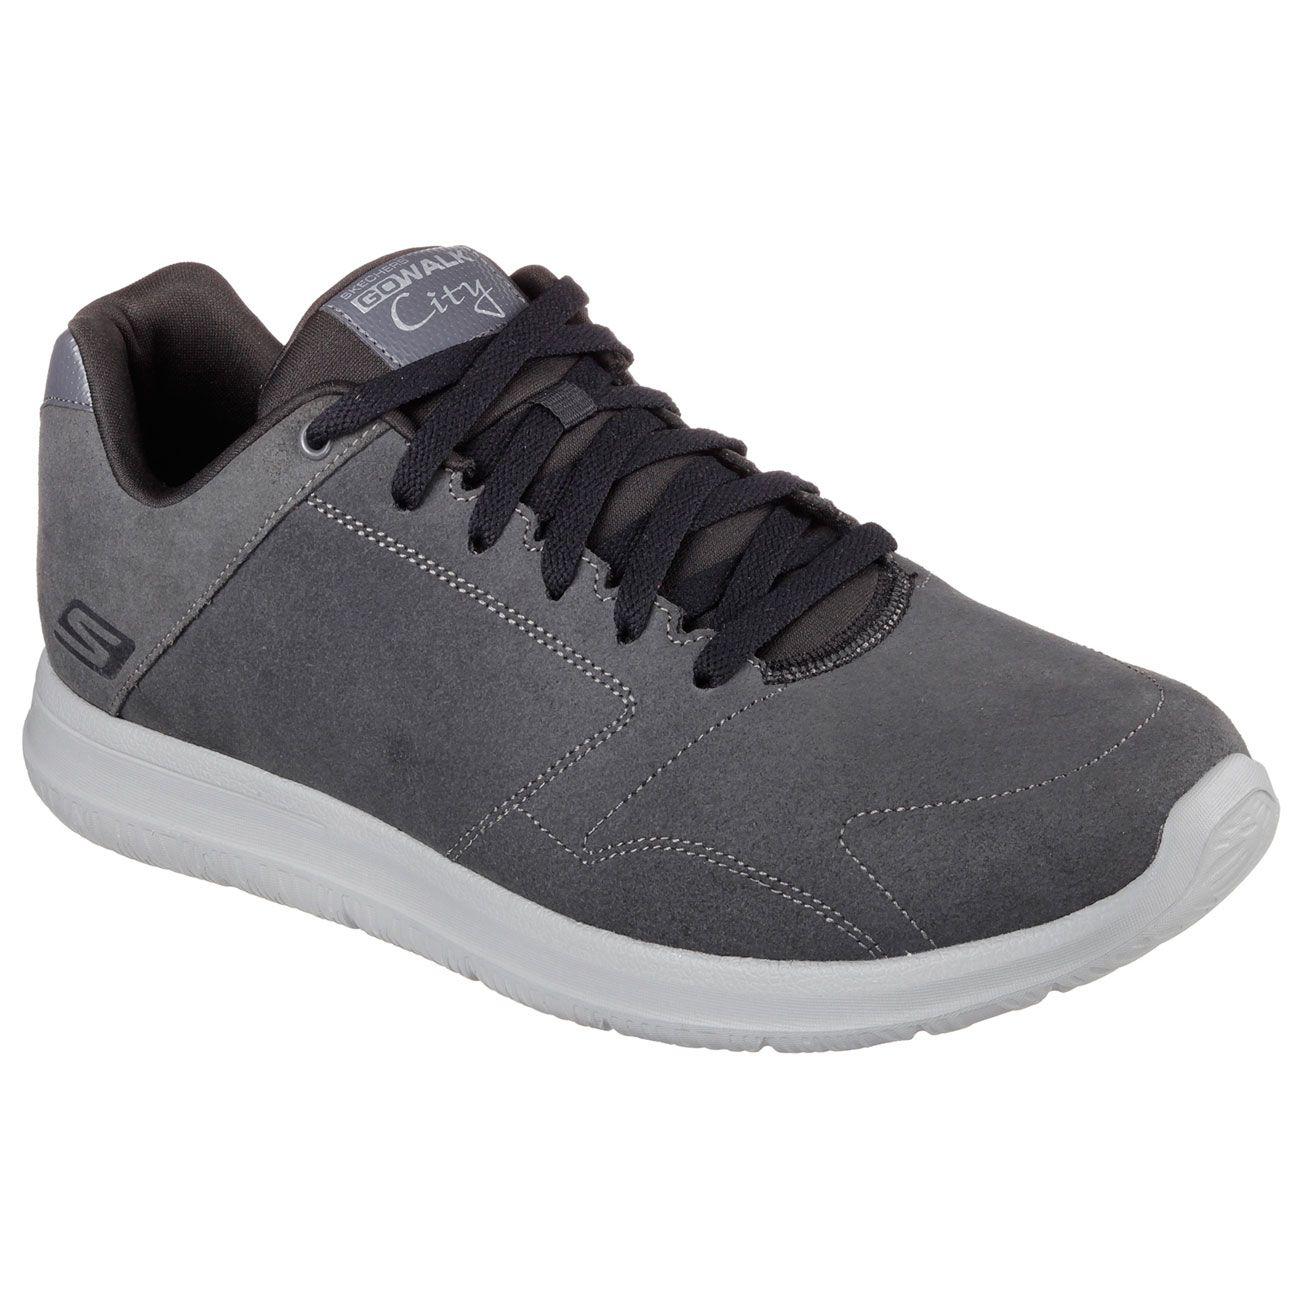 skechers go walk city retain mens walking shoes